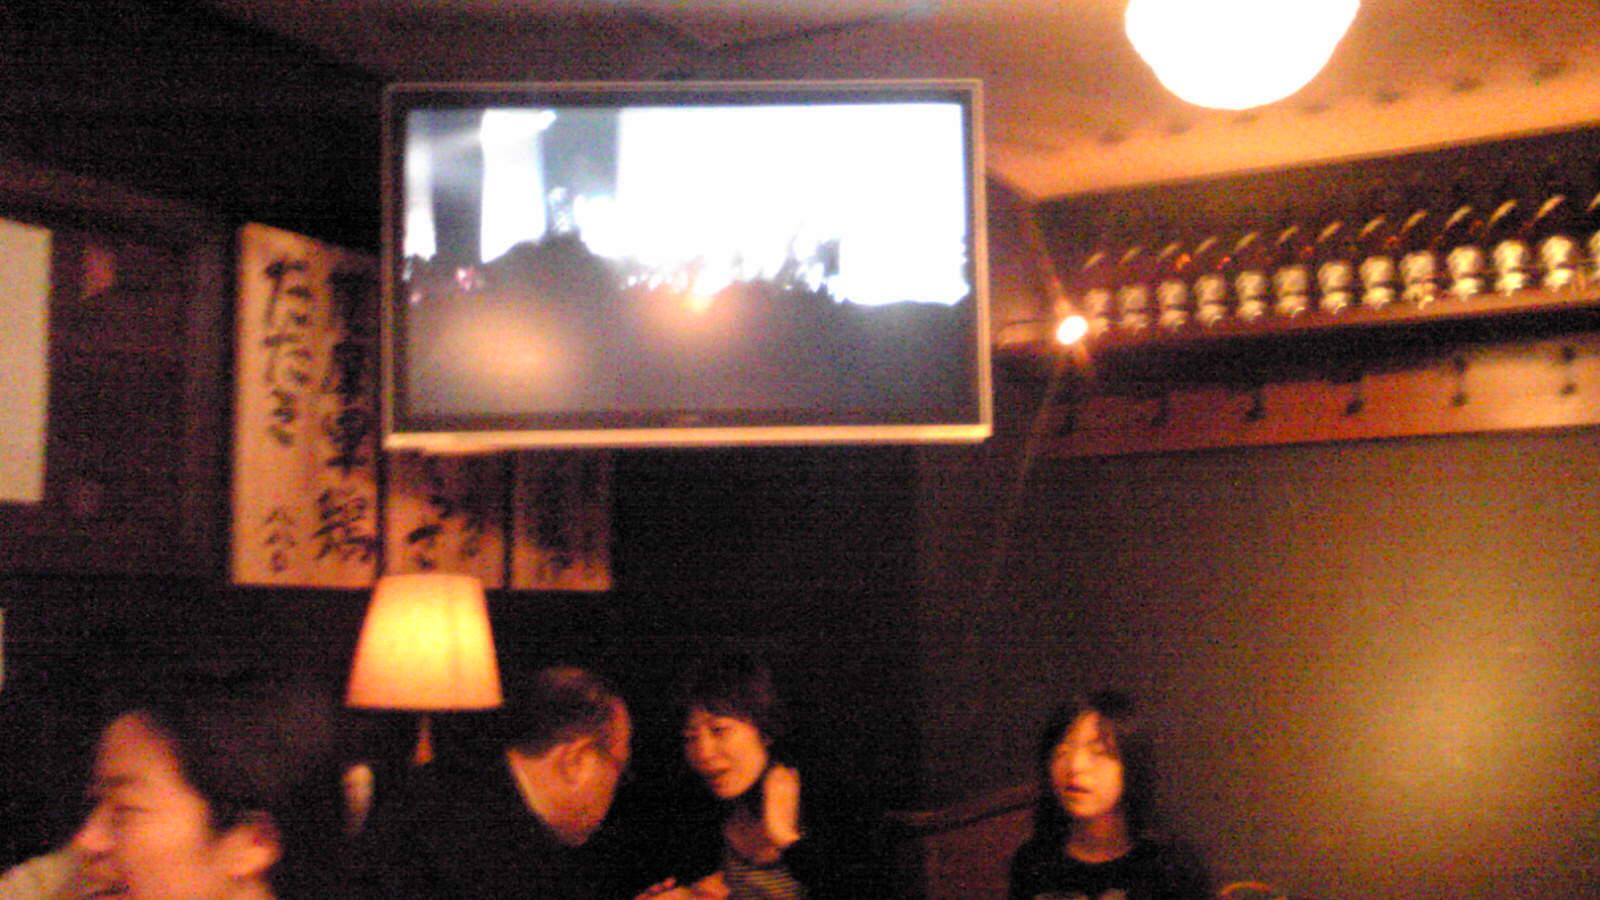 20100523-Image1397.jpg